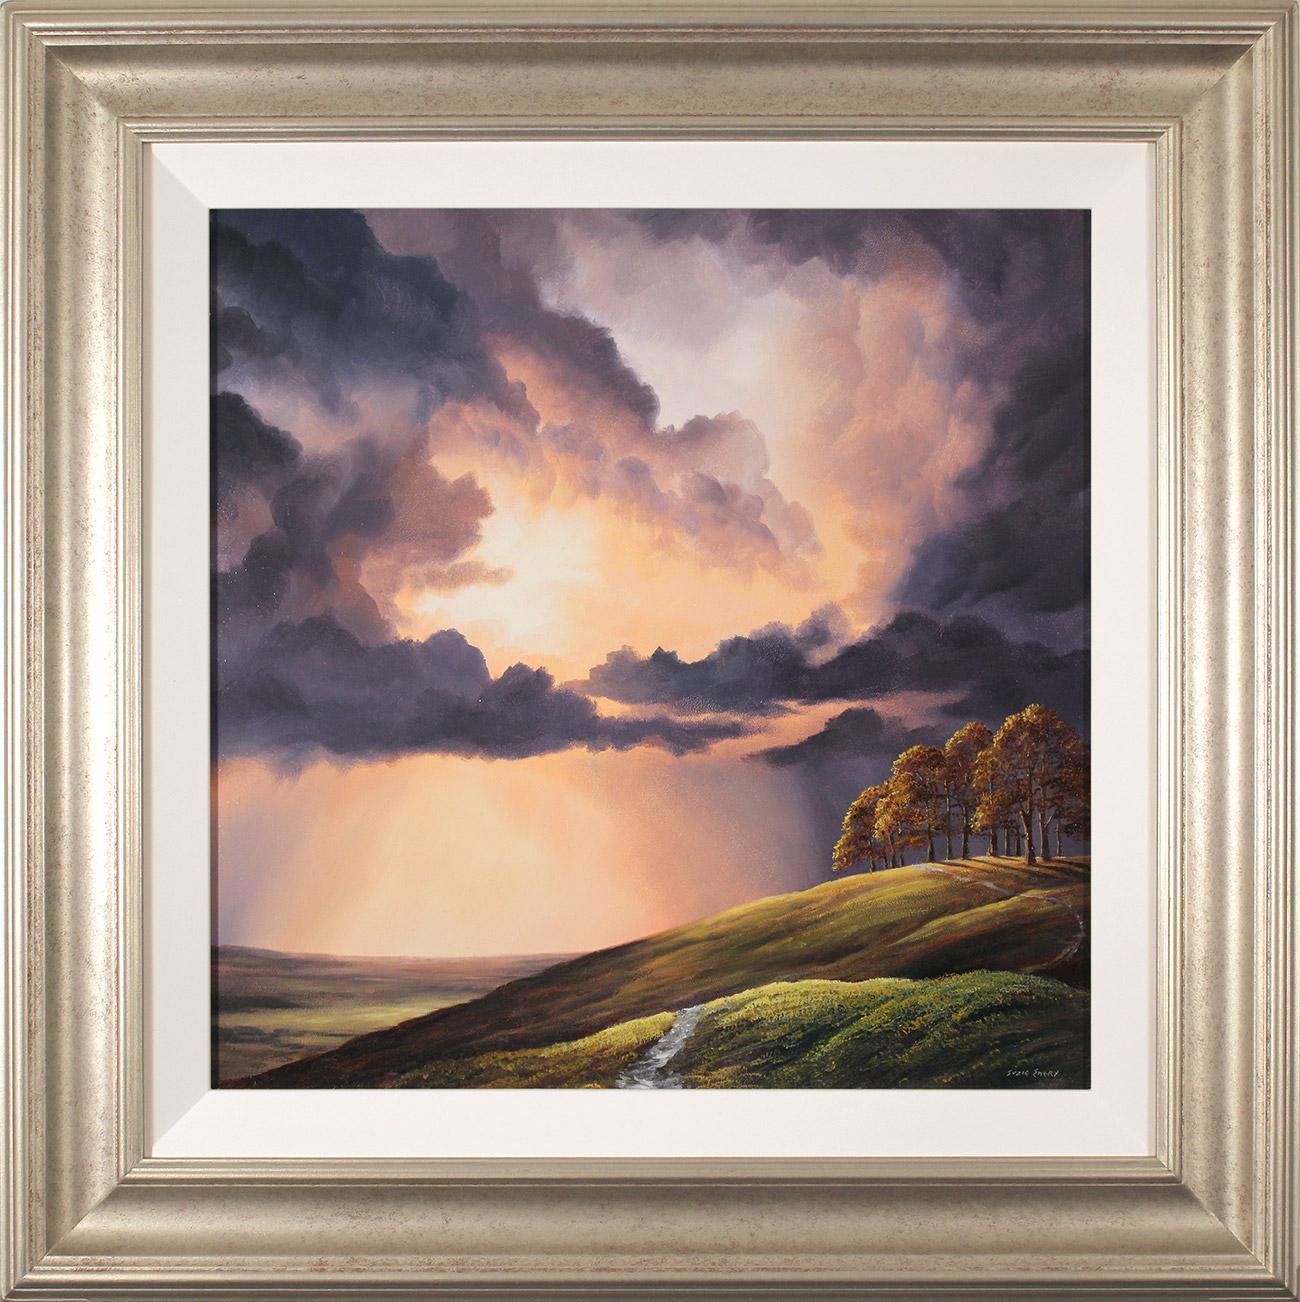 Suzie Emery, Original acrylic painting on board, Chiltern Ridgeway near Avebury , click to enlarge